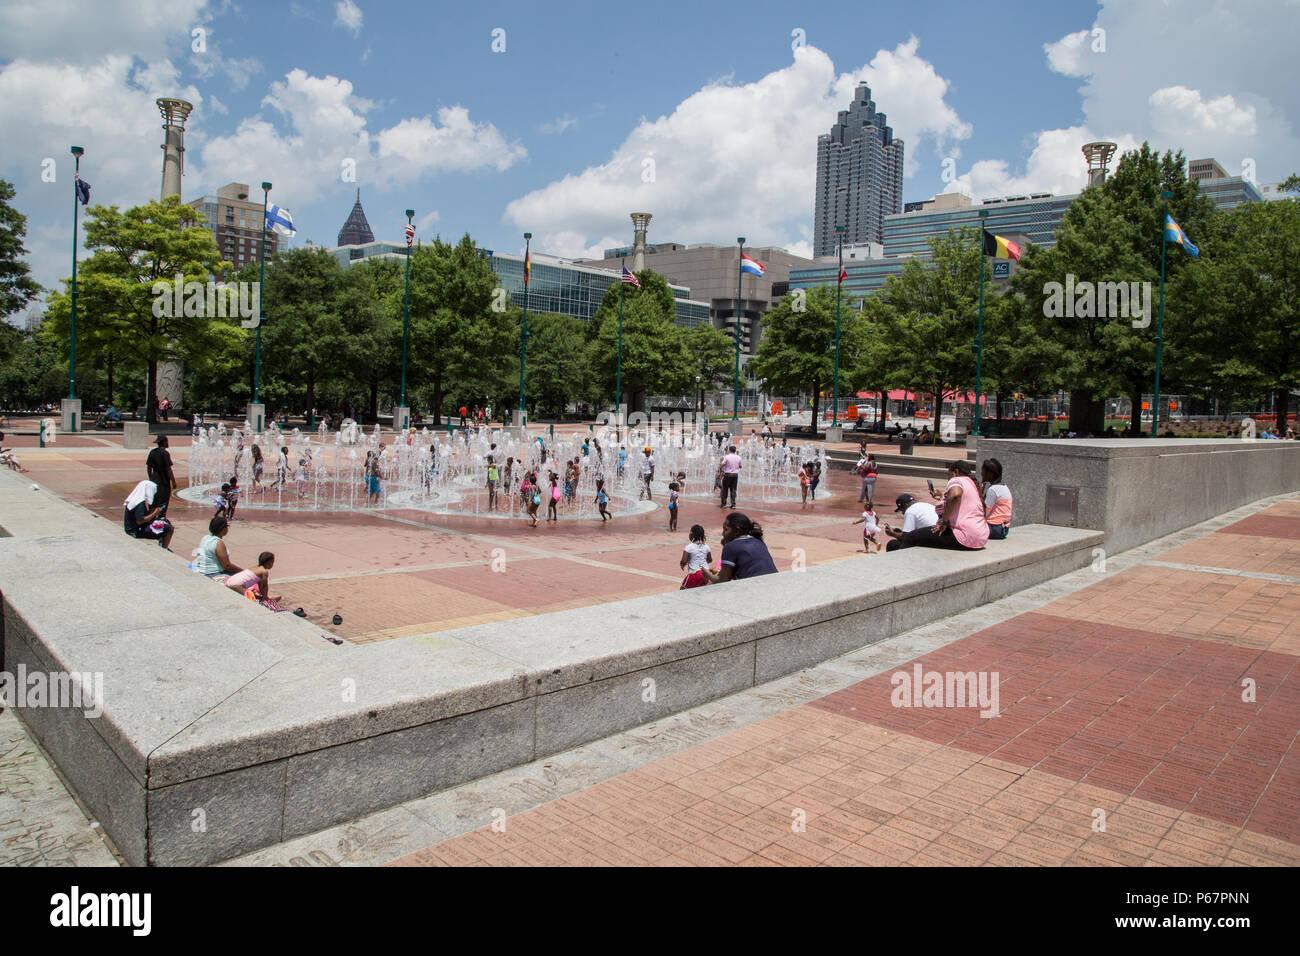 children enjoying the fountain in Centennial Park, Atlanta - Stock Image